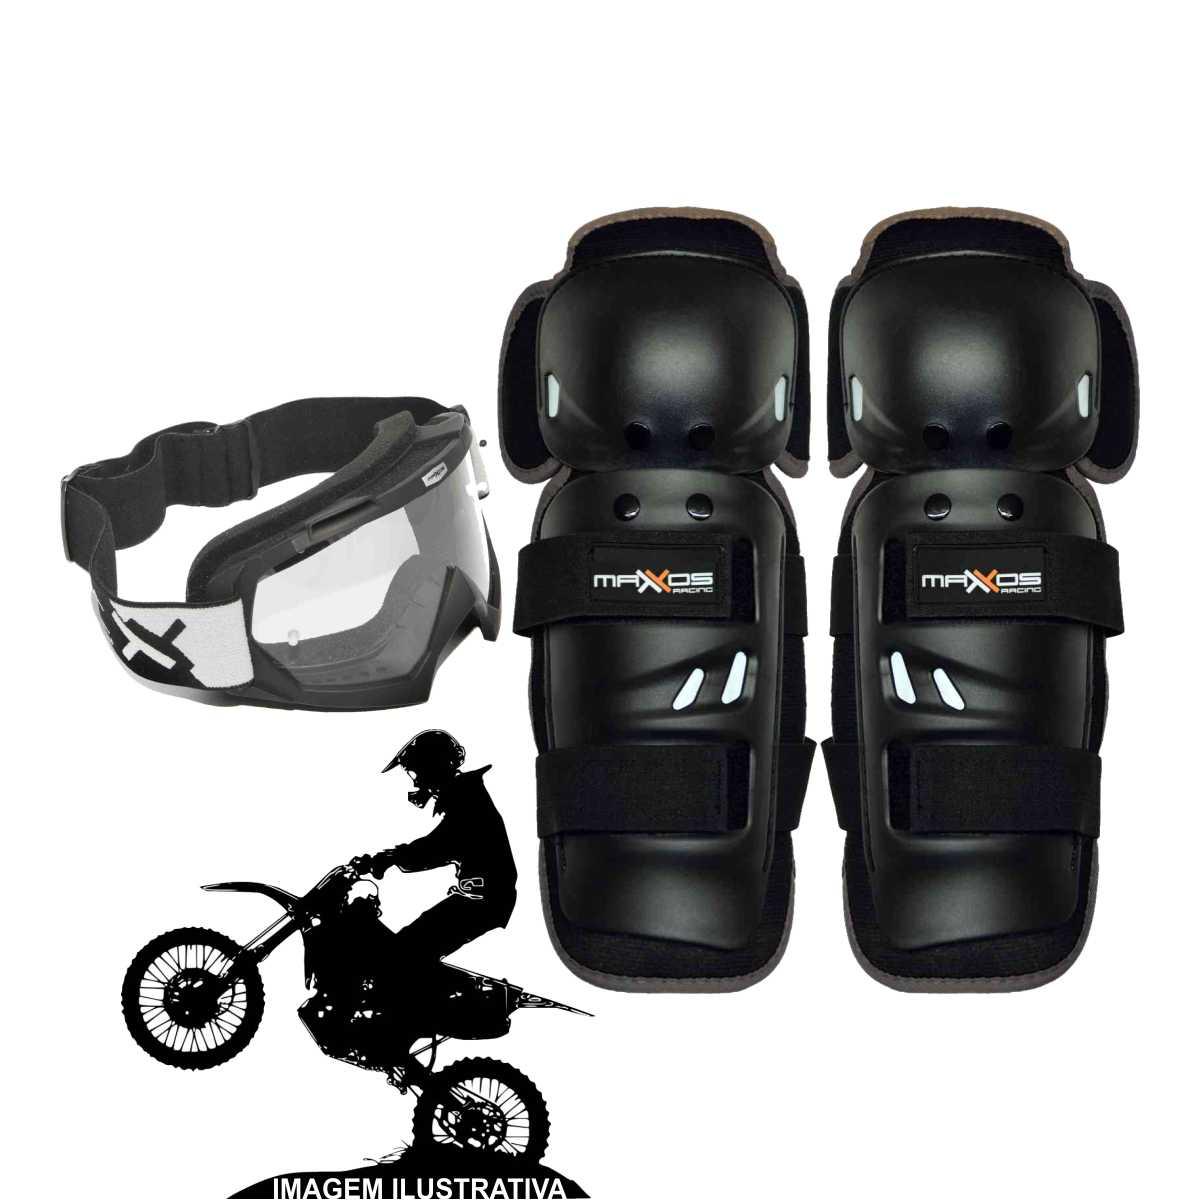 KIT JOELHEIRA MOTOCROSS MATTOS RACING MX PRETO + ÓCULOS CROSS OFF-ROAD COMBAT LENTE CRISTAL